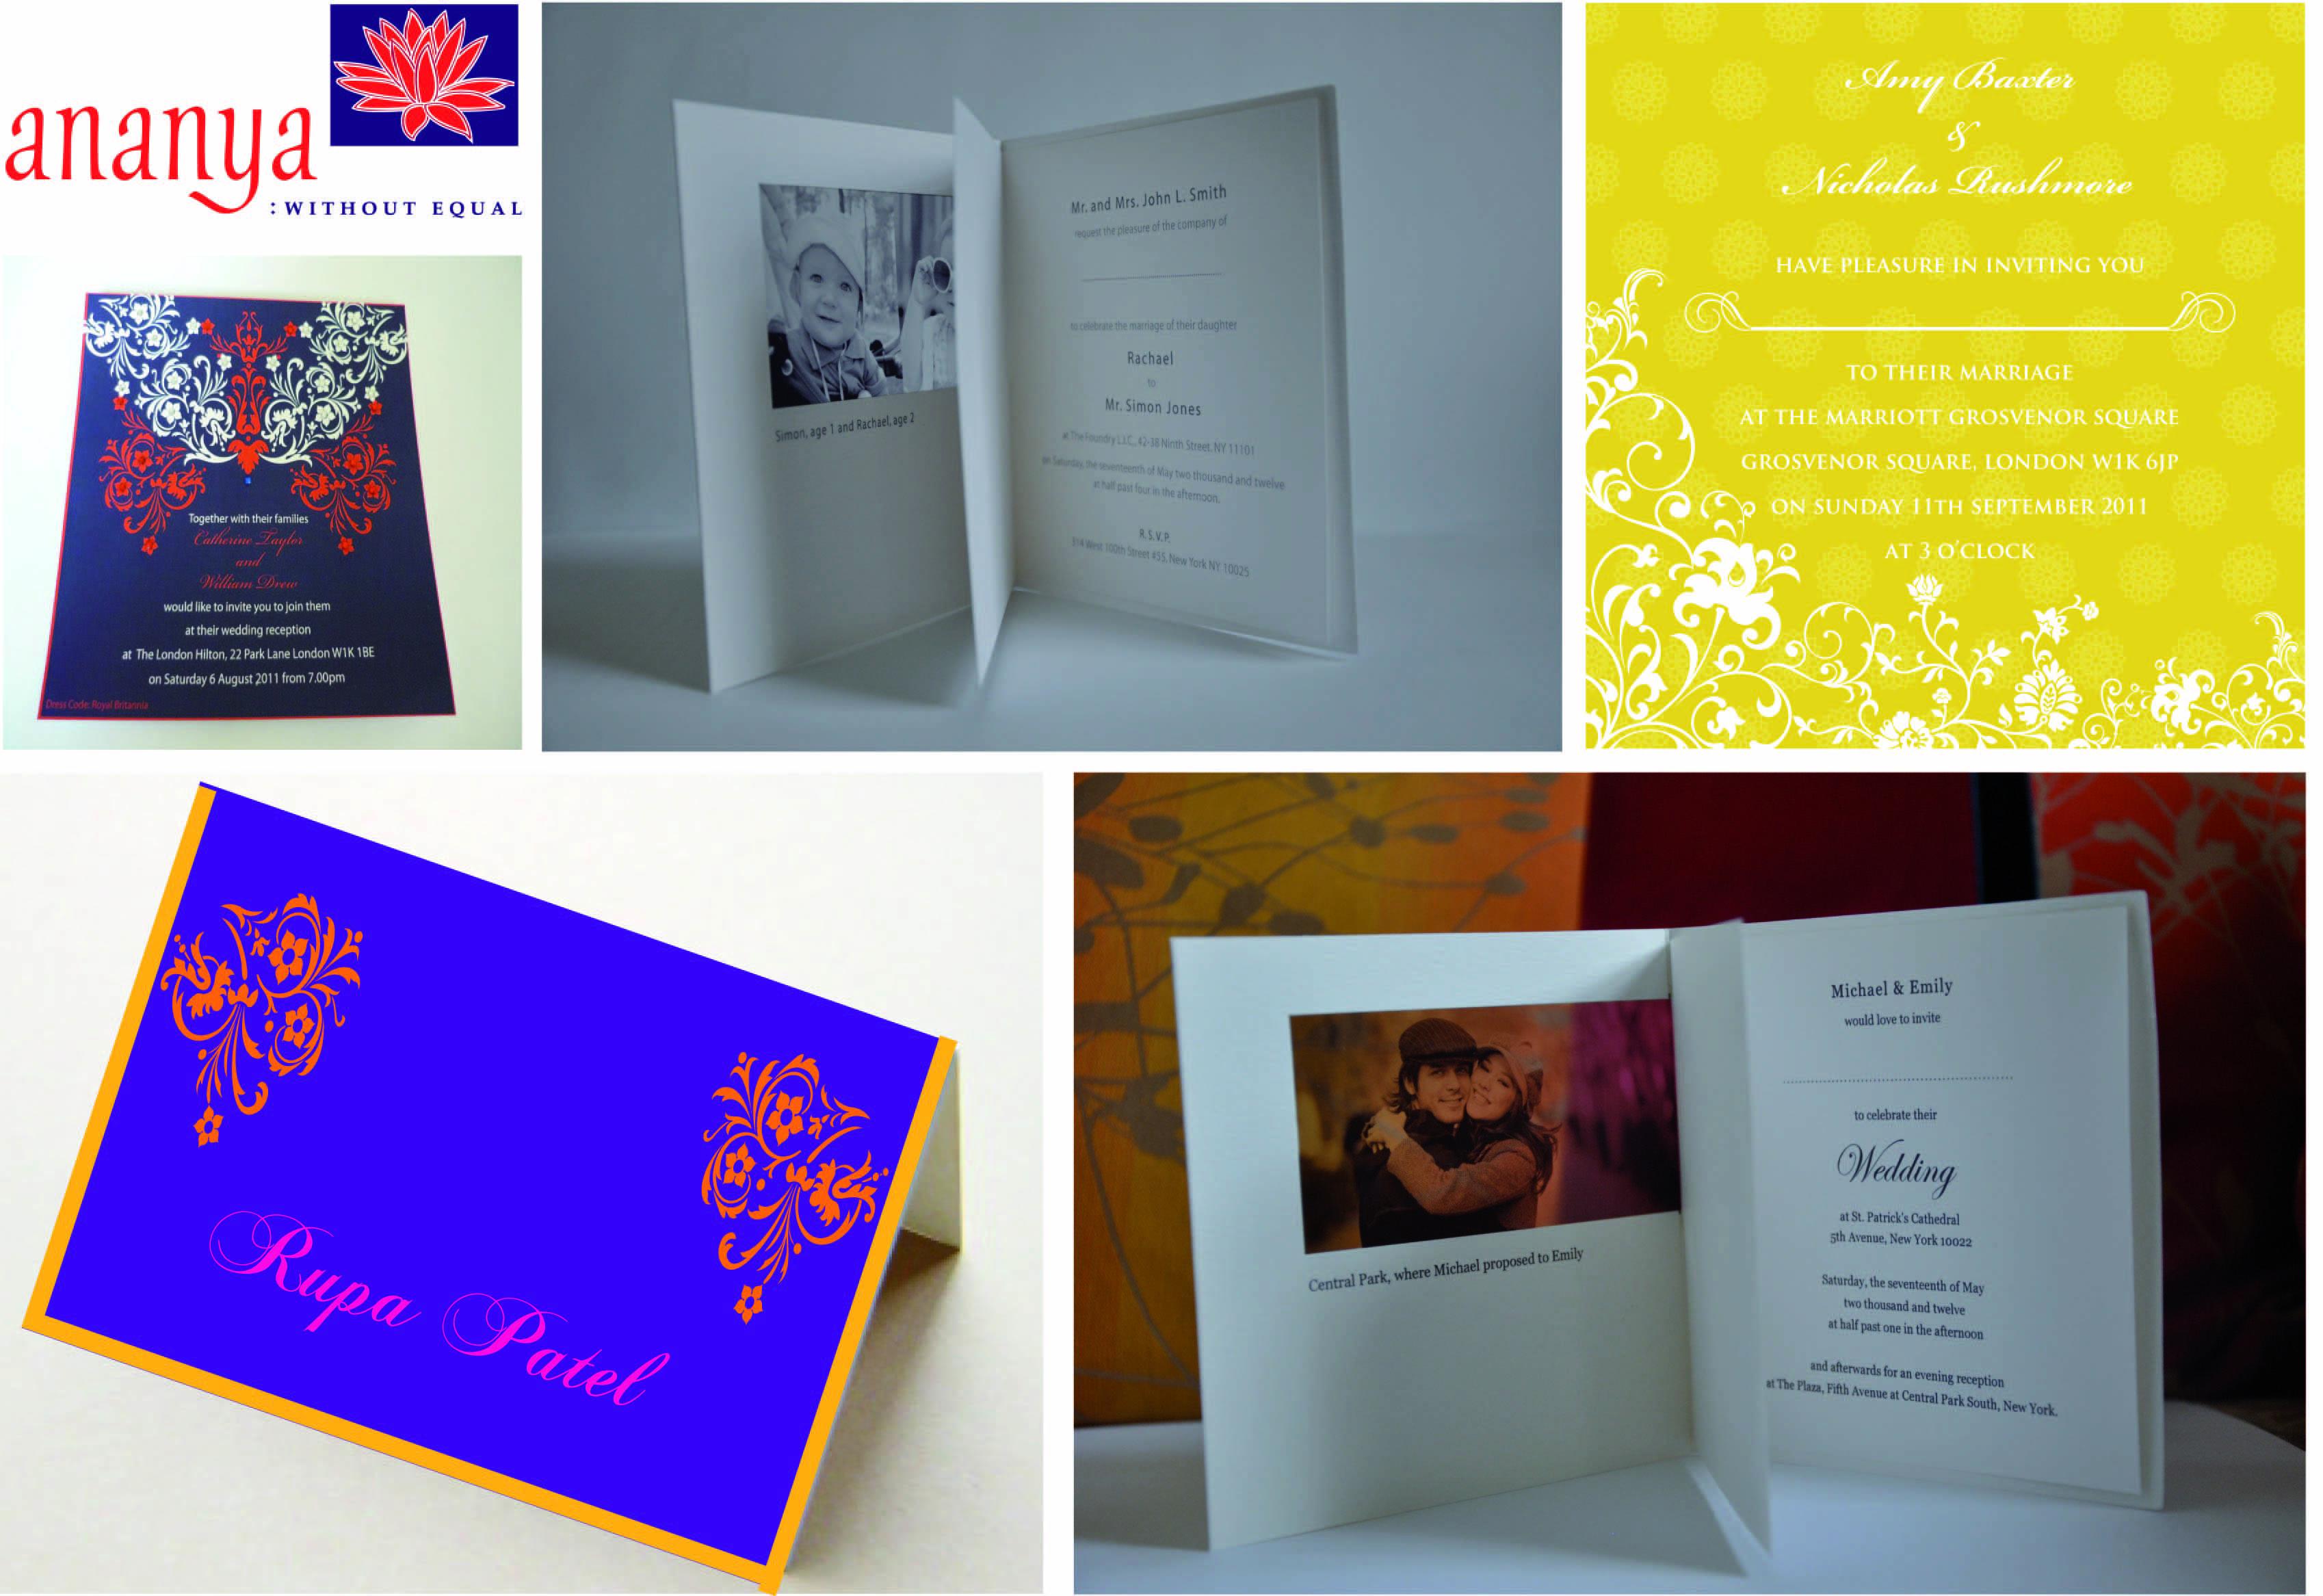 ananya wedding invitations in New York